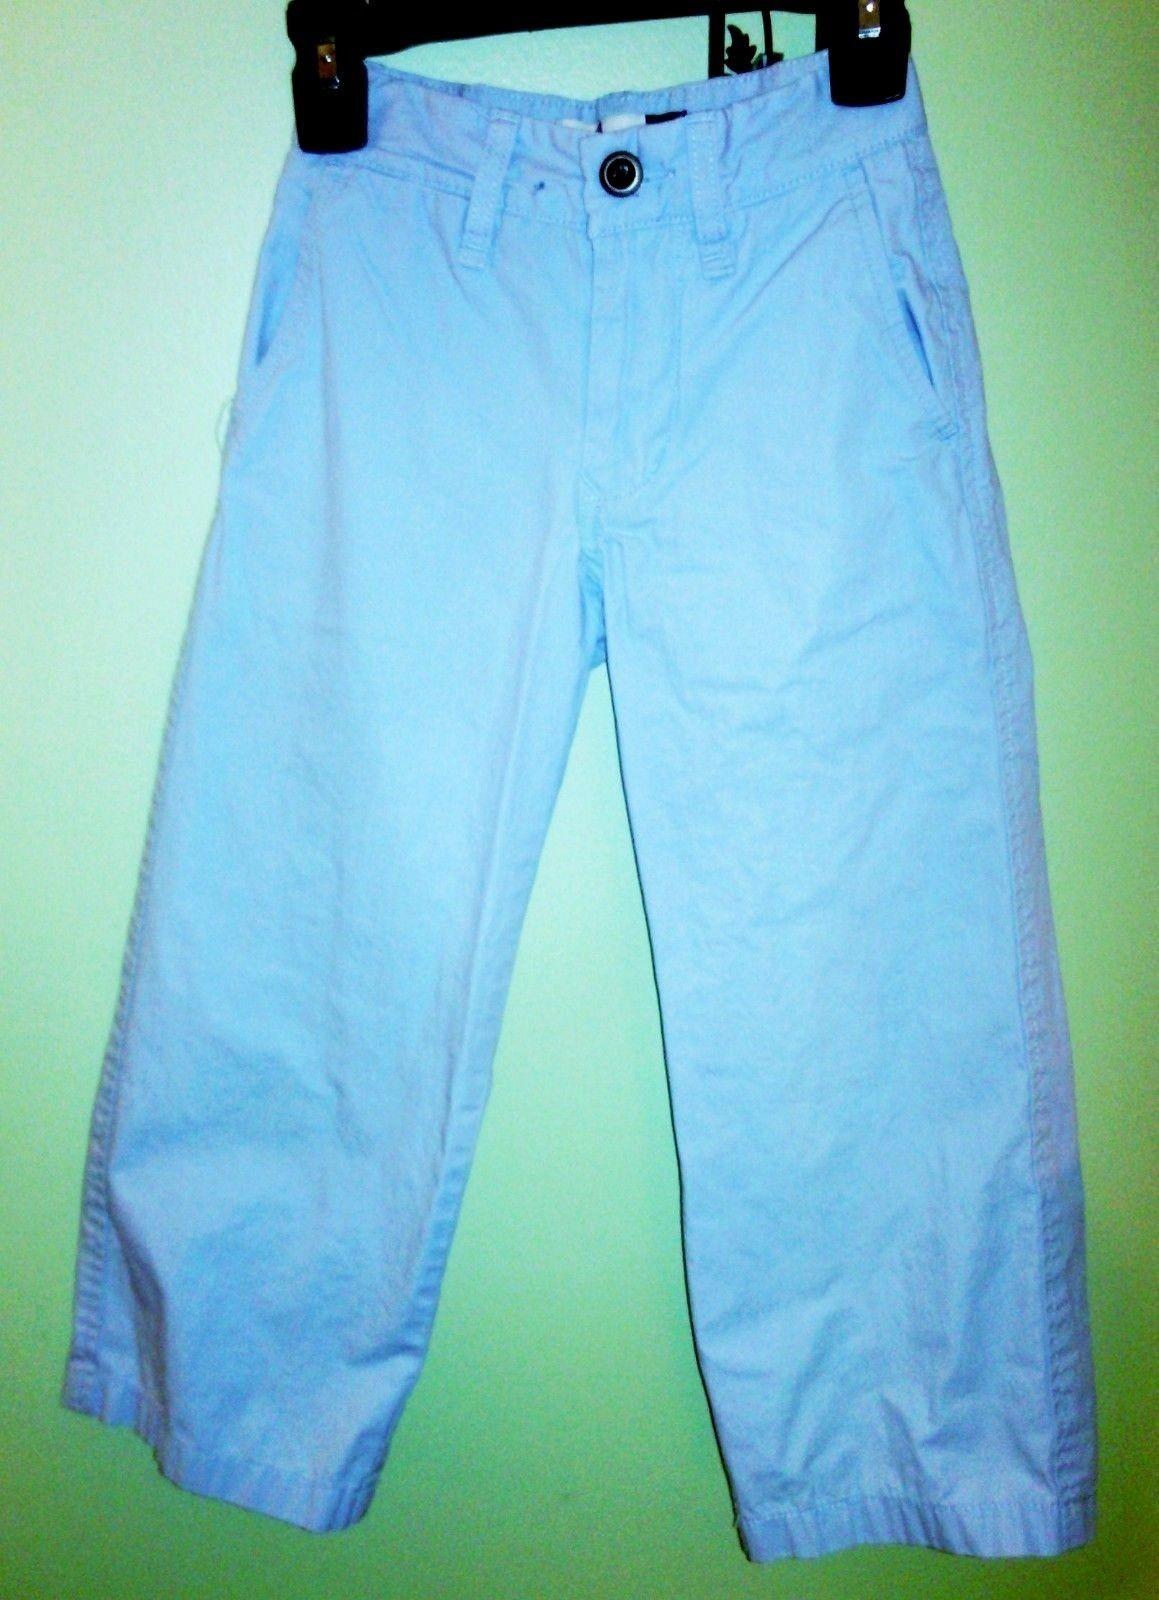 Boys/Toddler Set GAP Relaxed LT Blue Adj. Pants & Cat Jack L/S Button Shirt Blue